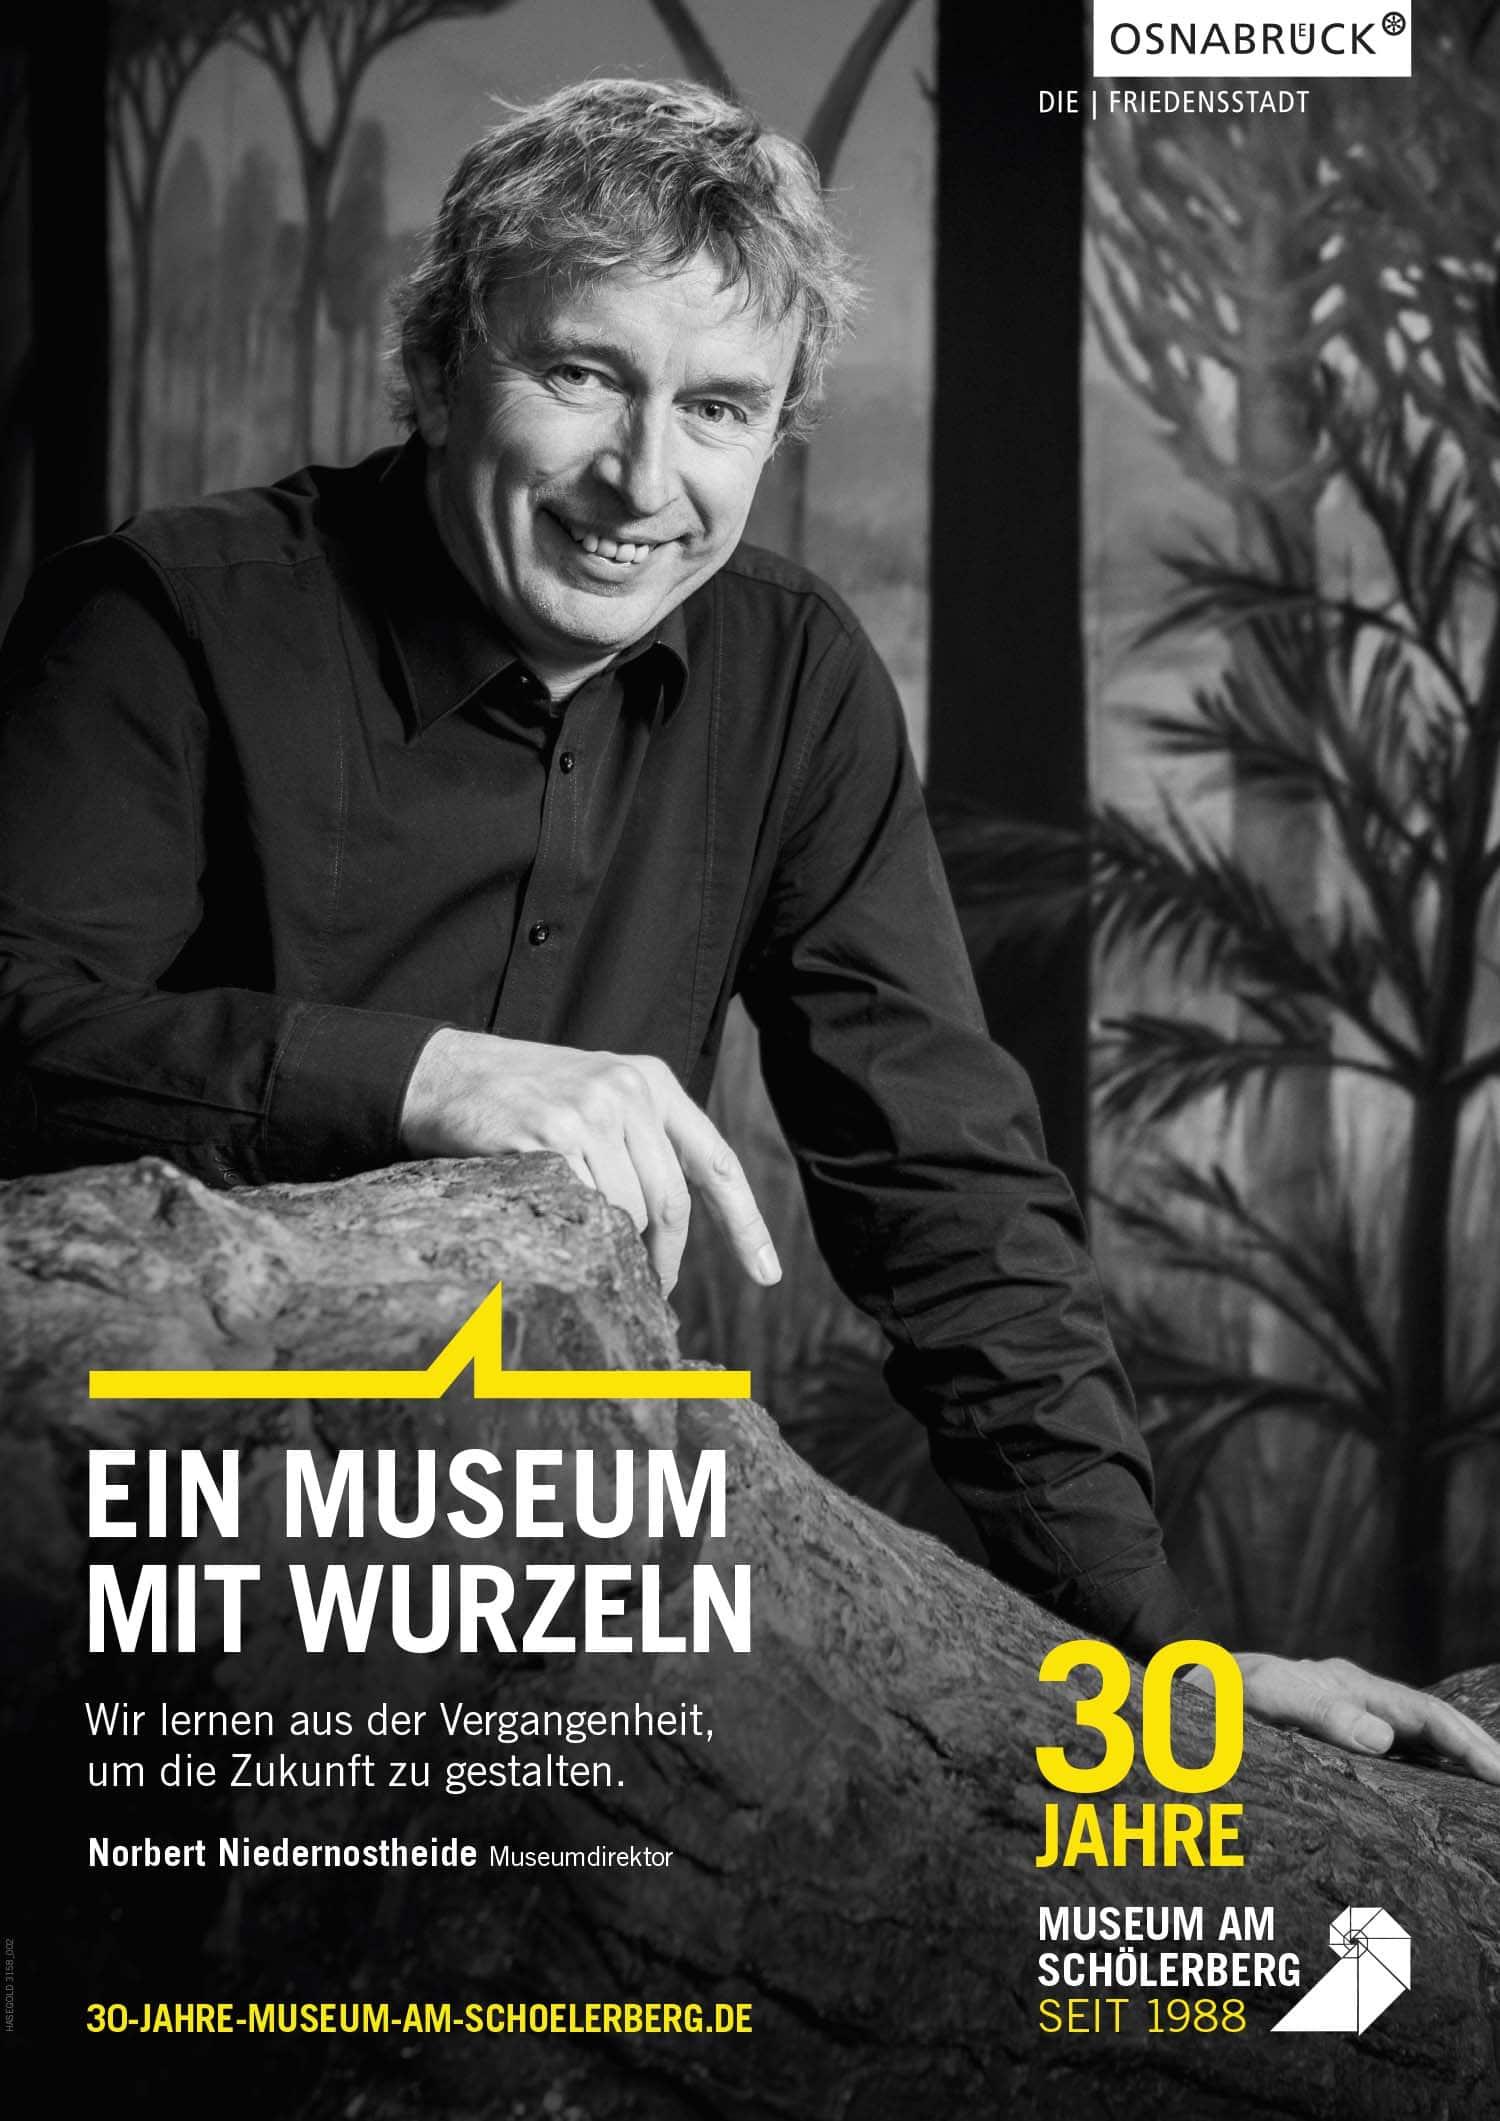 Plakat Osnabrück: Die Plakatserie für das Museum am Schölerberg zeigt Norbert Niedernostheide